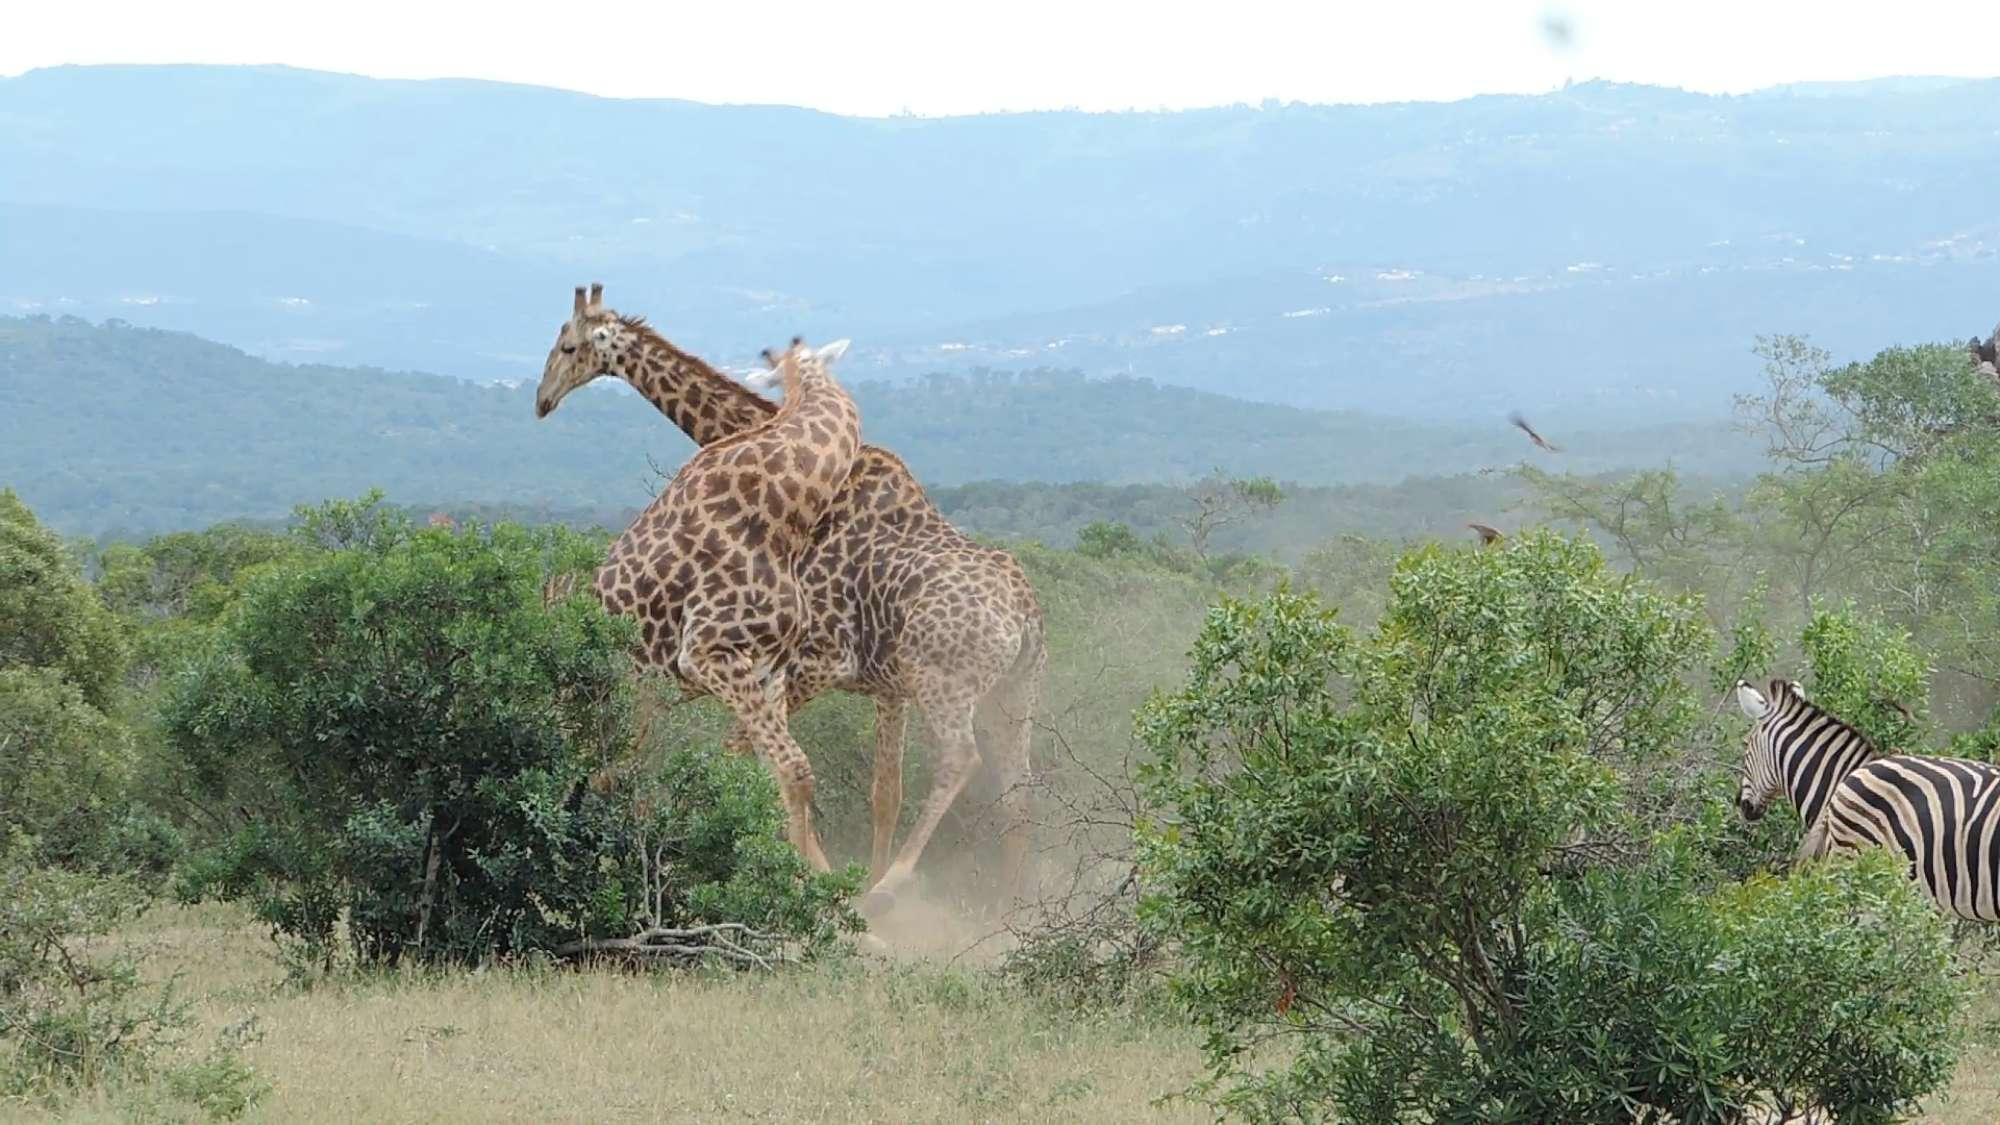 Pamje spektakolare se si grinden dy gjirafa, zebrat bëjnë sehir (FOTO)